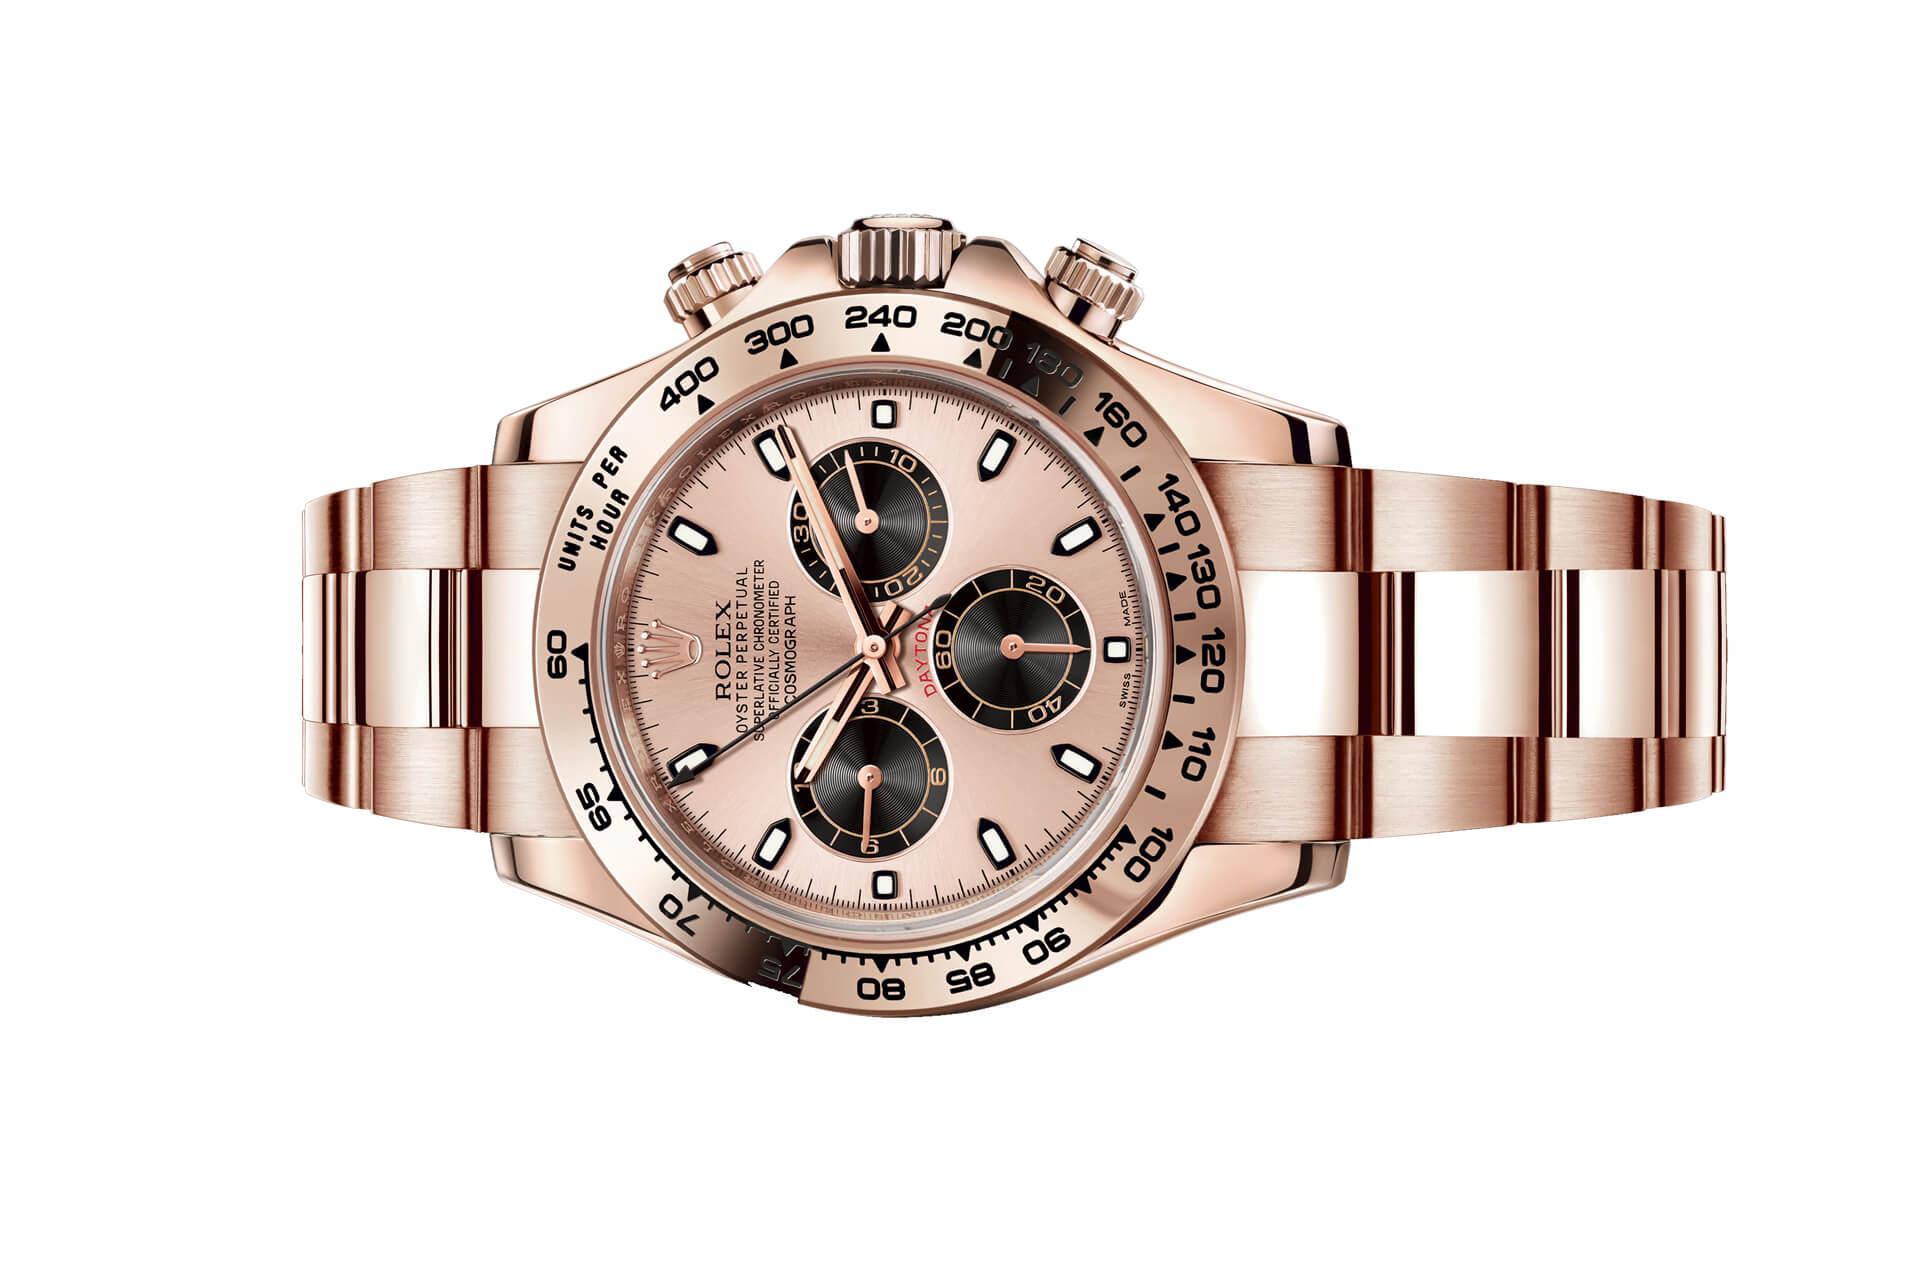 Đồng hồ Rolex Cosmograph Daytona 116505